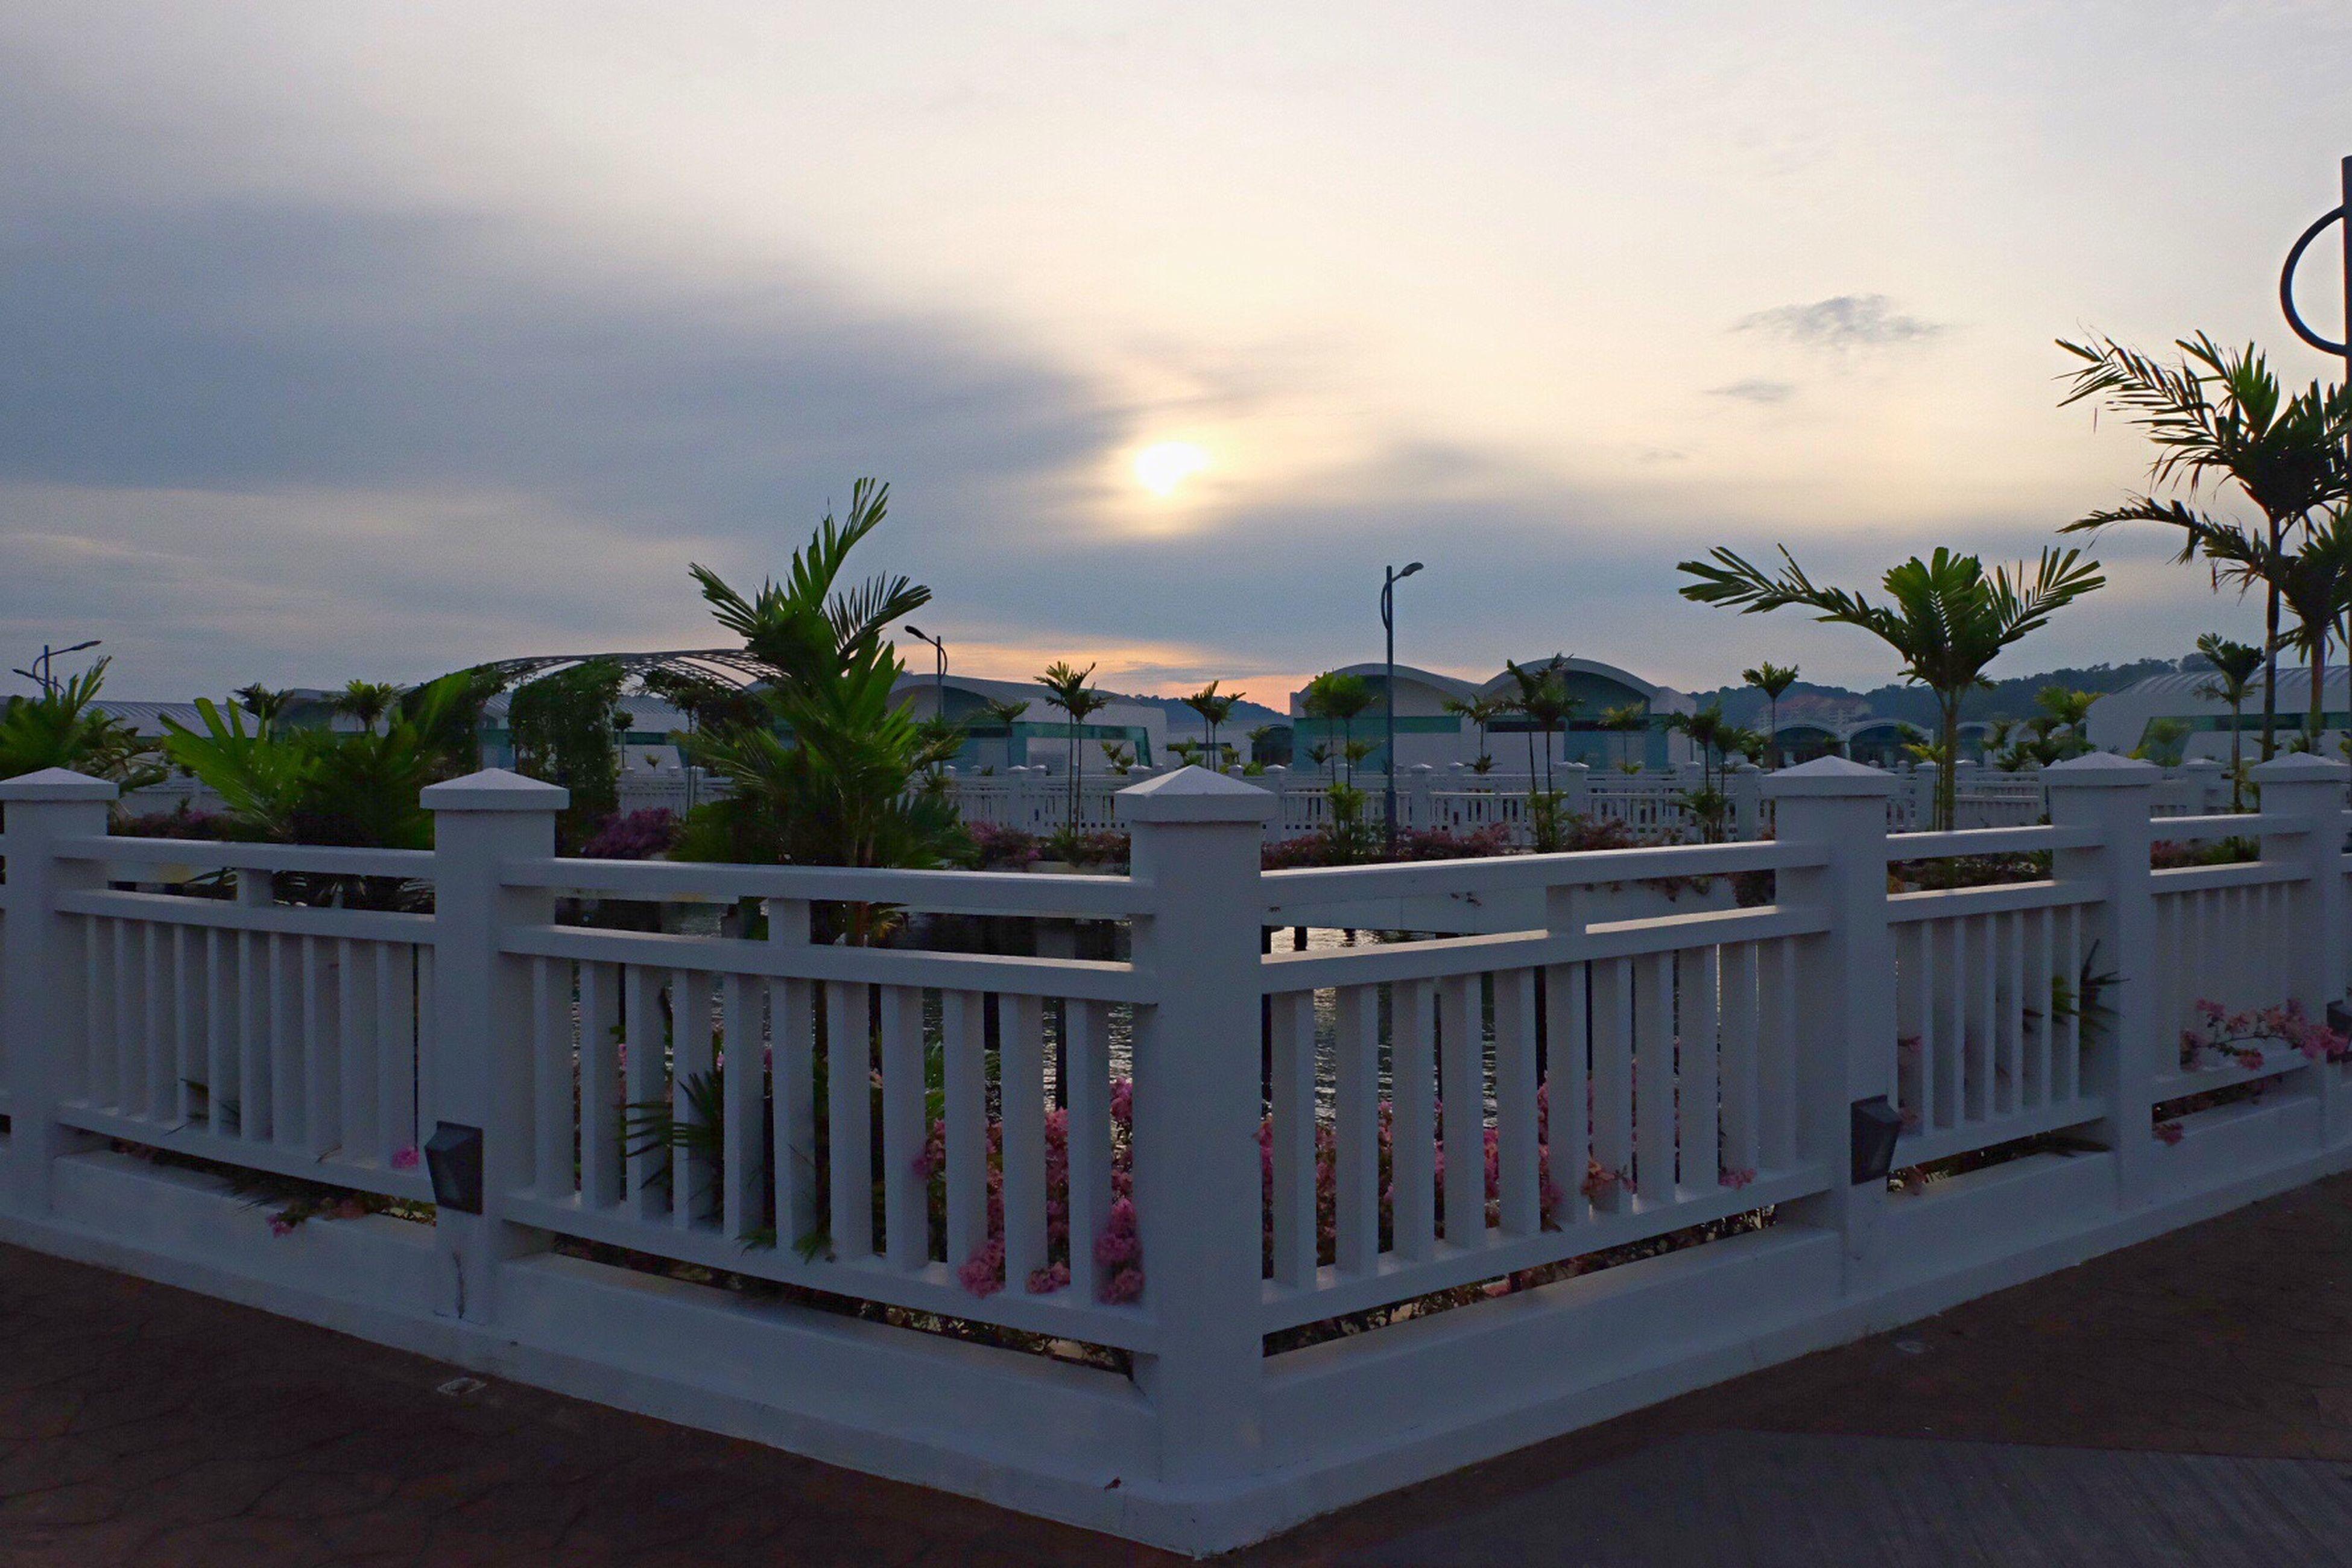 sky, cloud - sky, architecture, cloud, building exterior, water, outdoors, vacations, storm cloud, sea, sun, tourism, tourist resort, no people